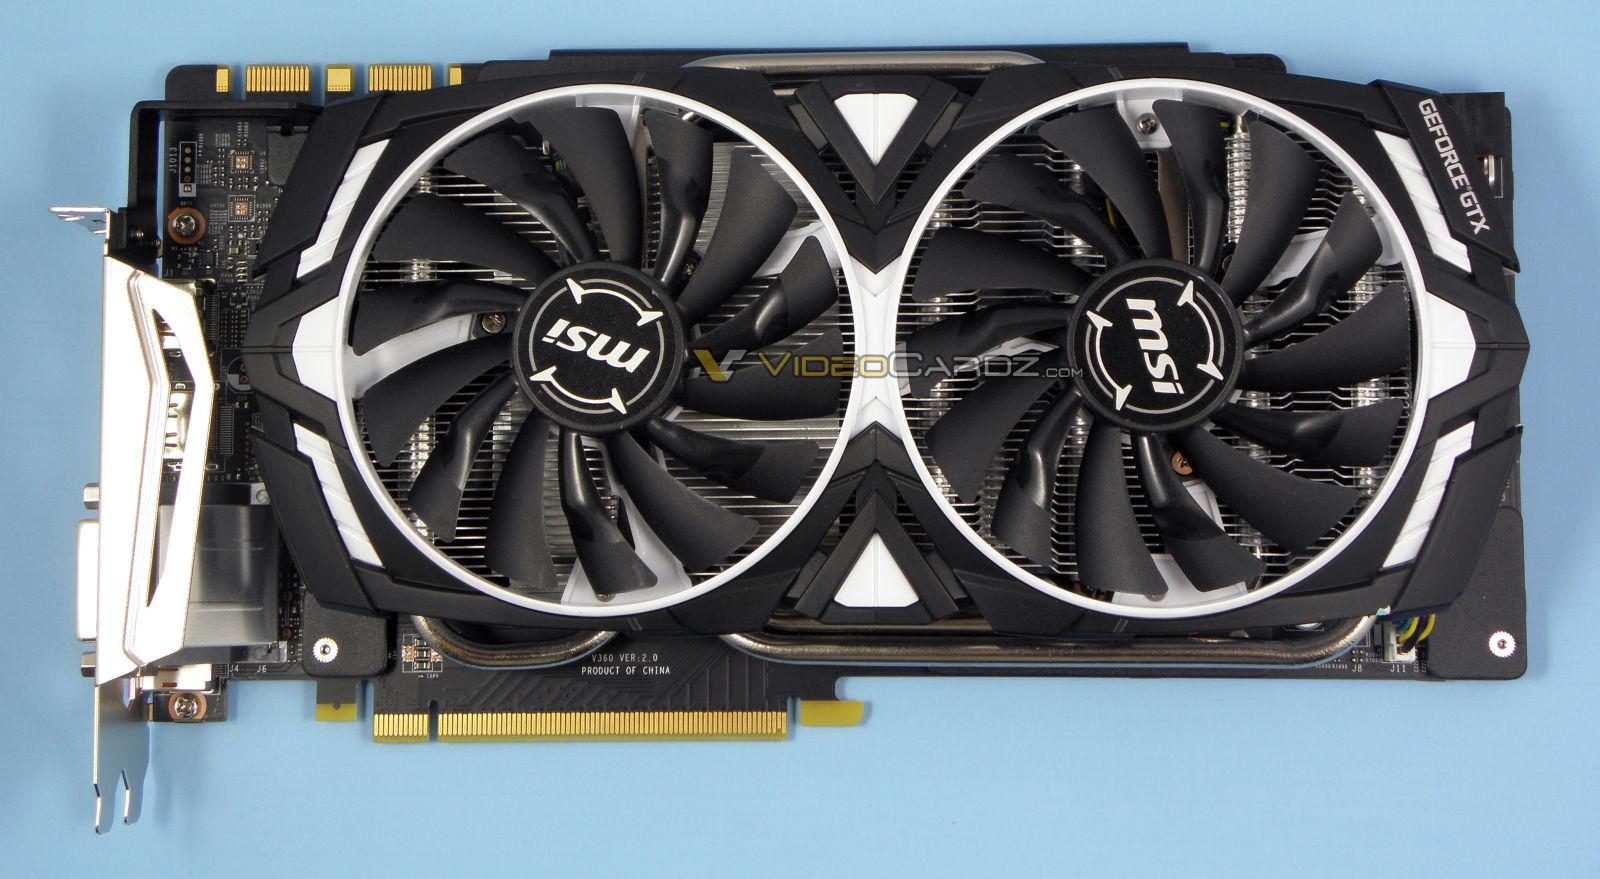 Msi Geforce Gtx 1080 Ti Armor Review Videocardz Com